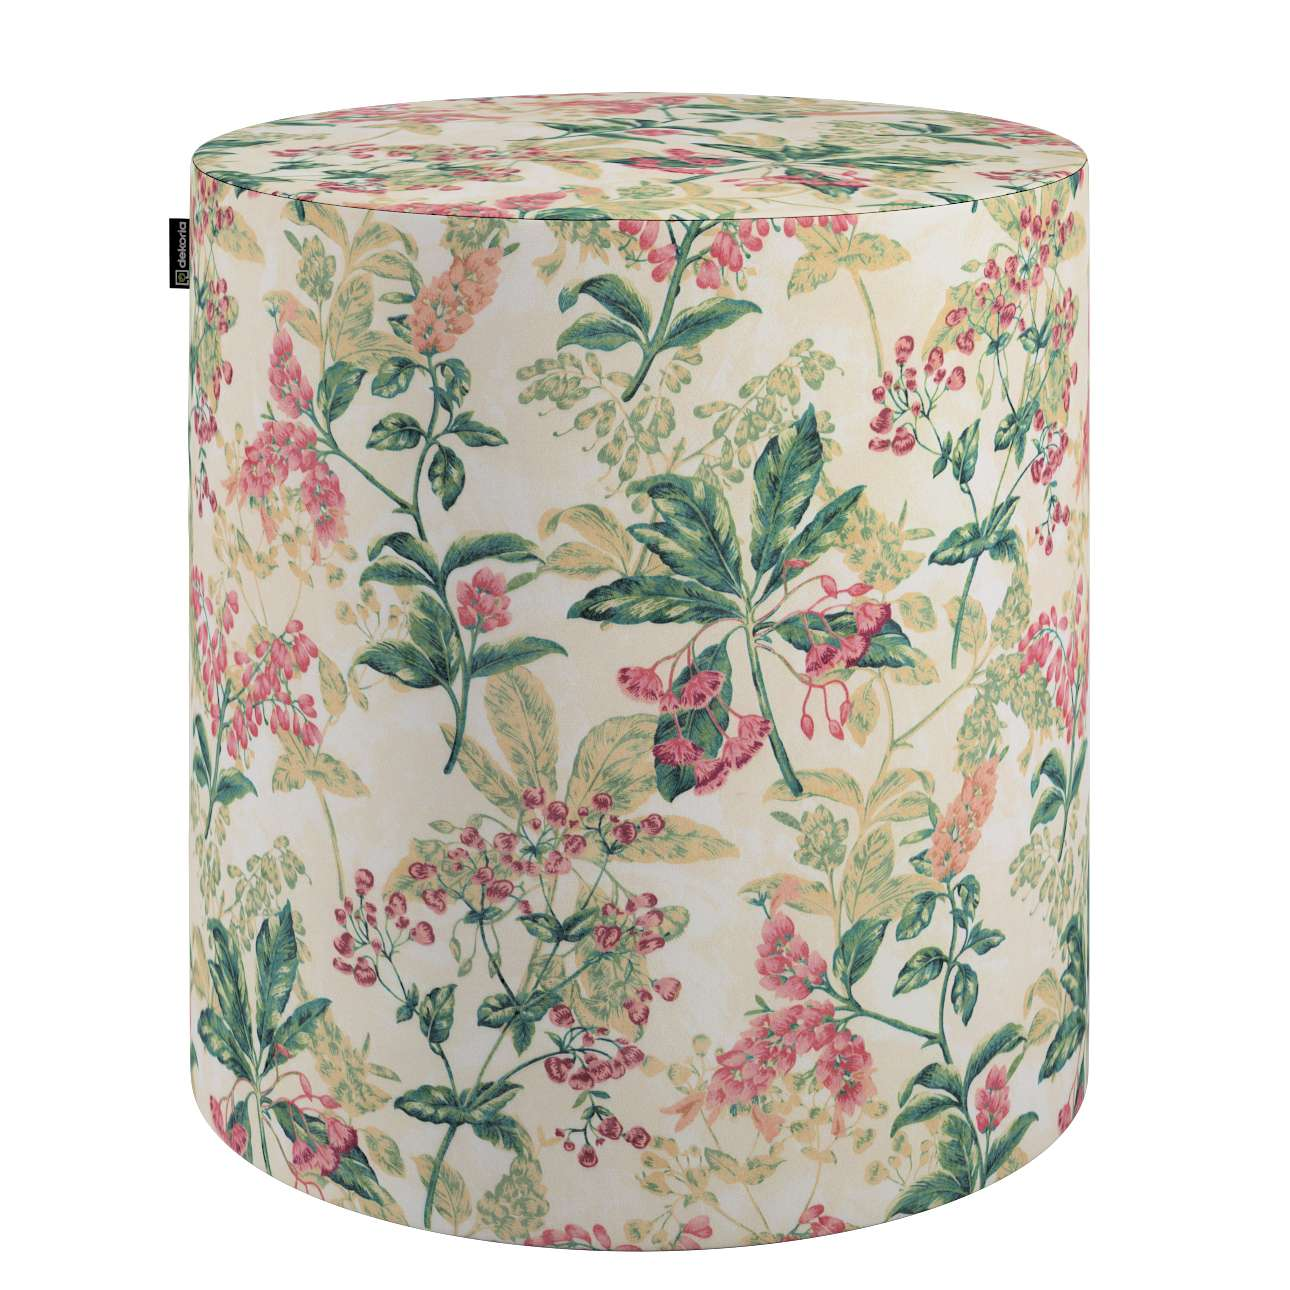 Pouf Barrel von der Kollektion Londres, Stoff: 143-41